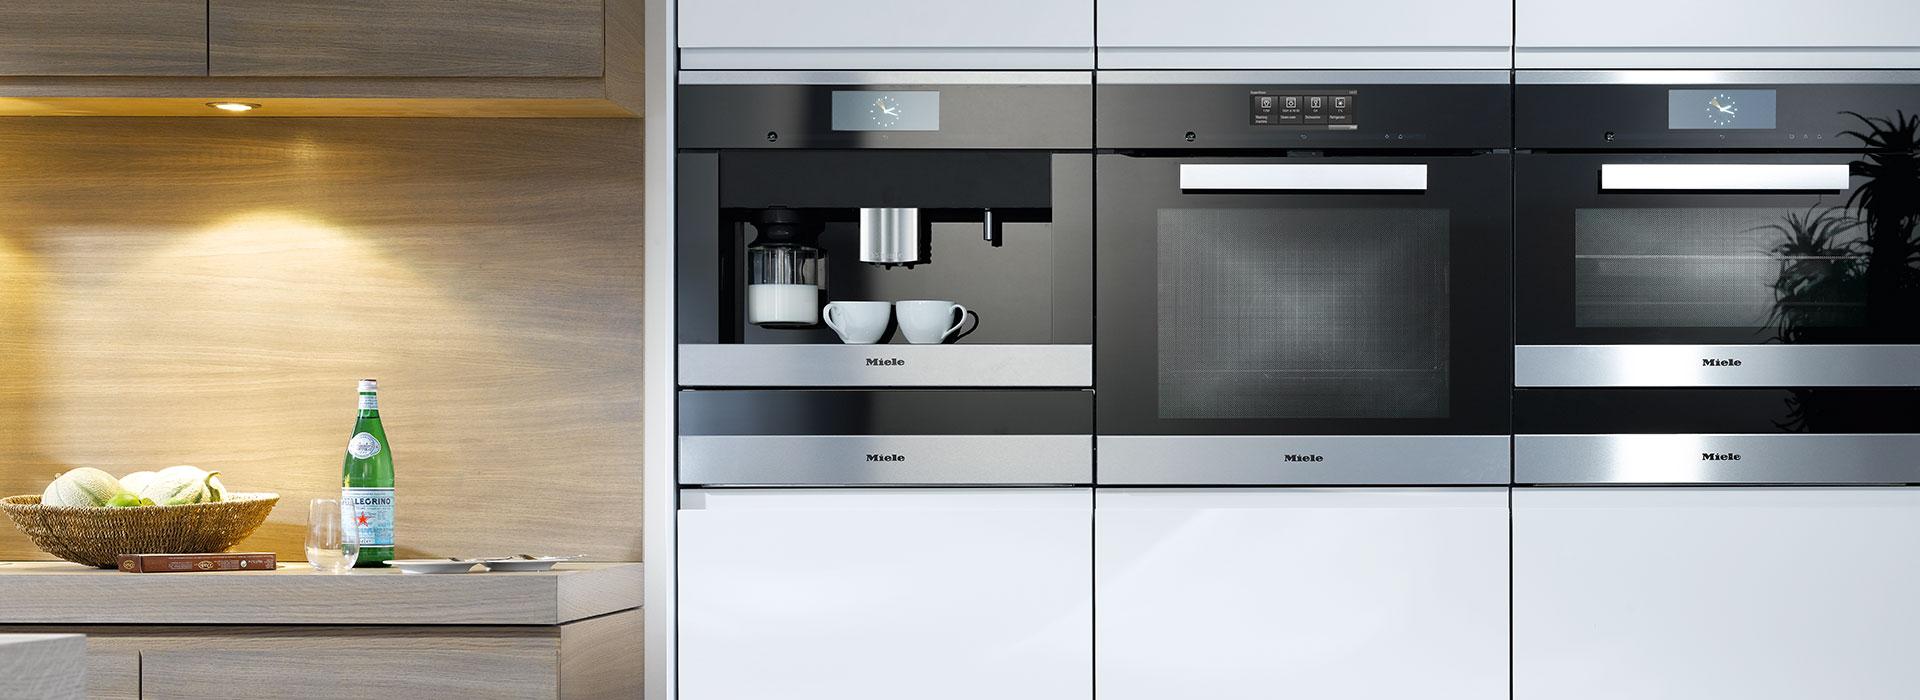 miele home innovative networks miele. Black Bedroom Furniture Sets. Home Design Ideas